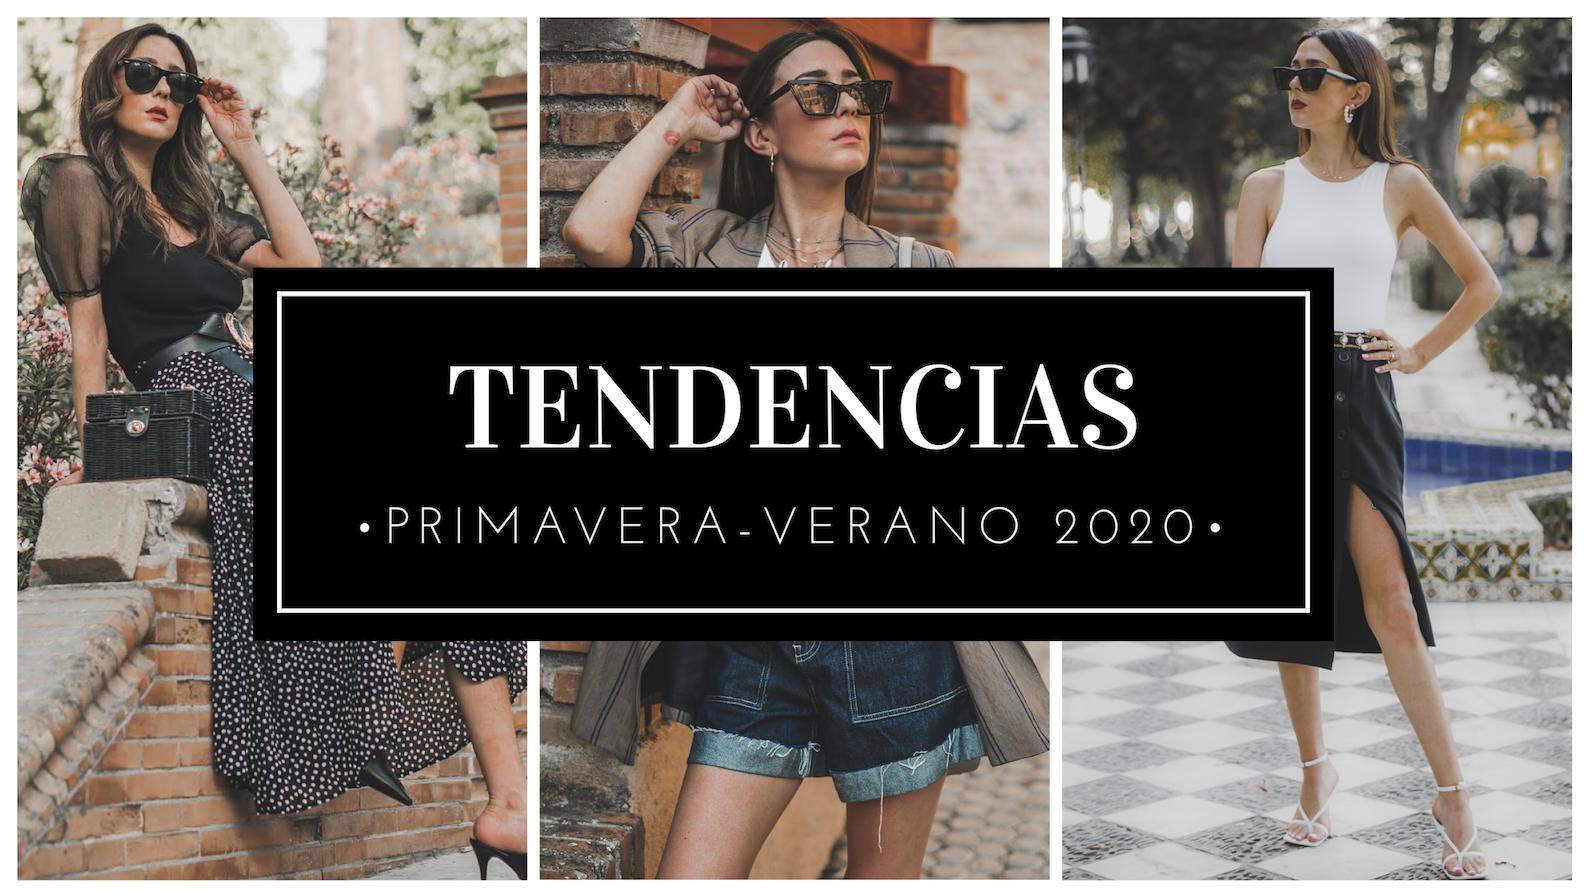 tendencias primavera verano 2020